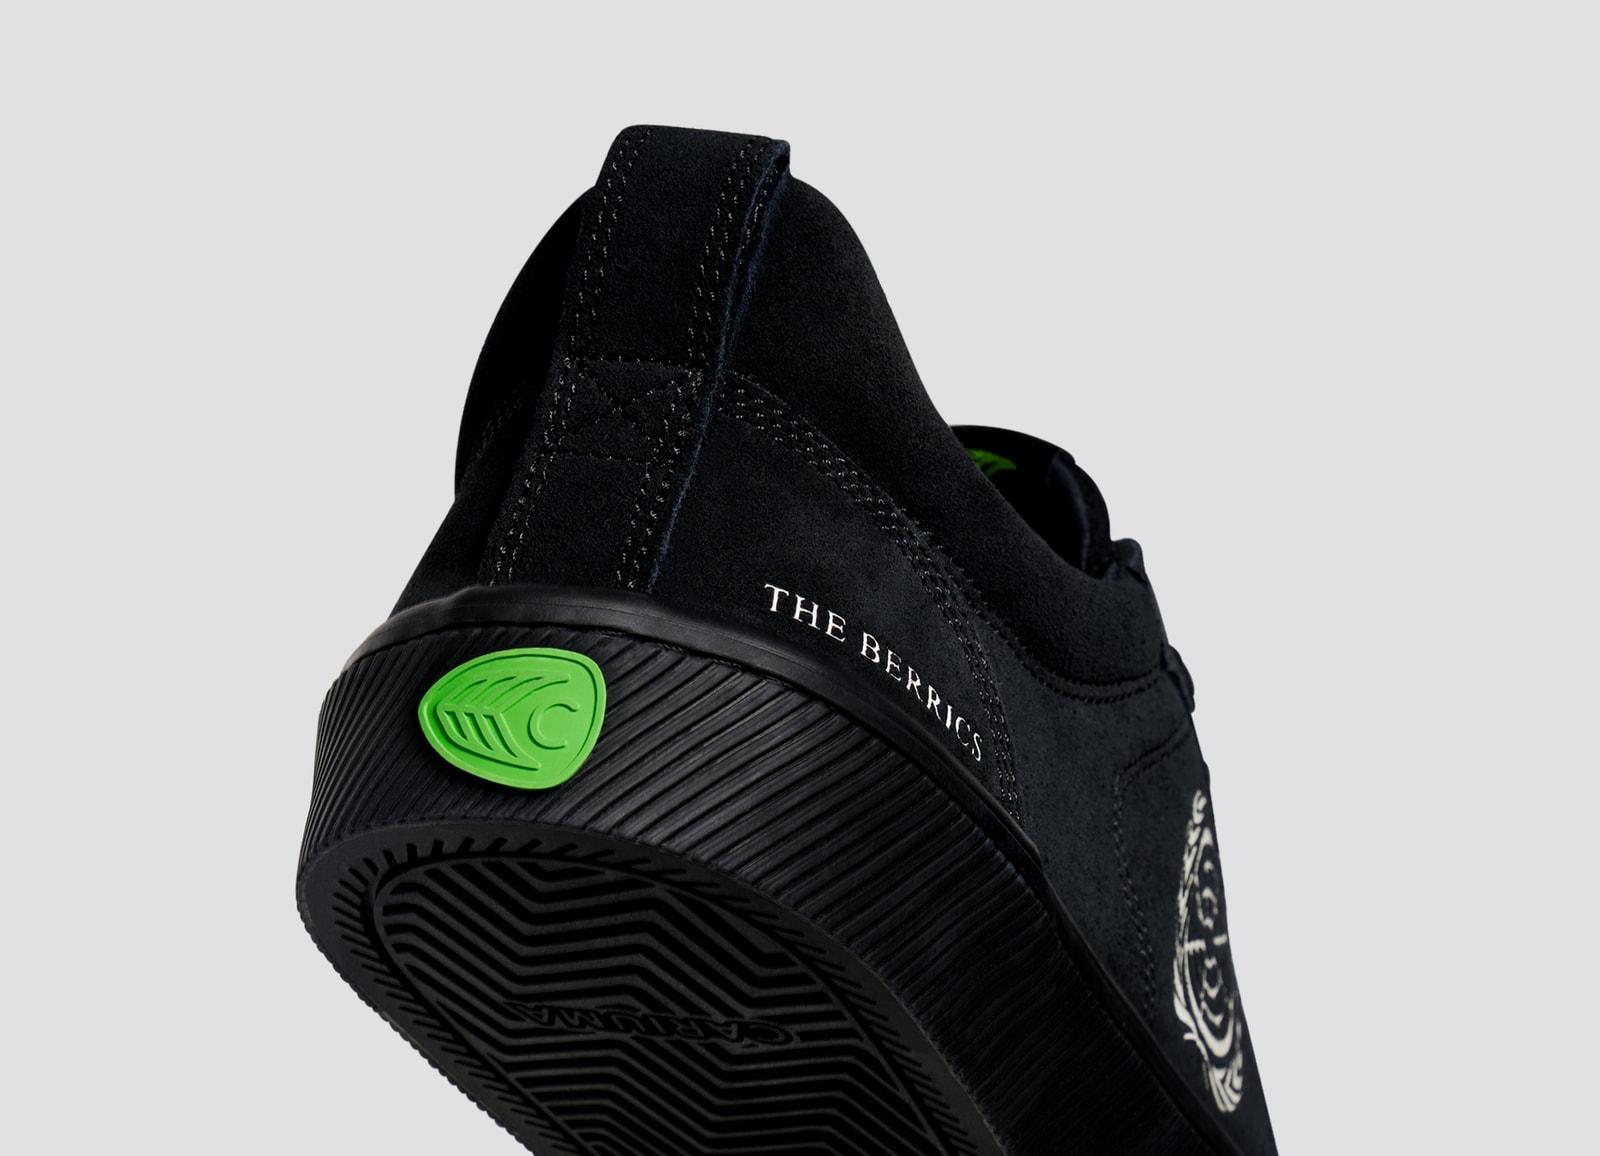 Skateability Meets Sustainability: The Berrics x Cariuma Catiba Pro Collab